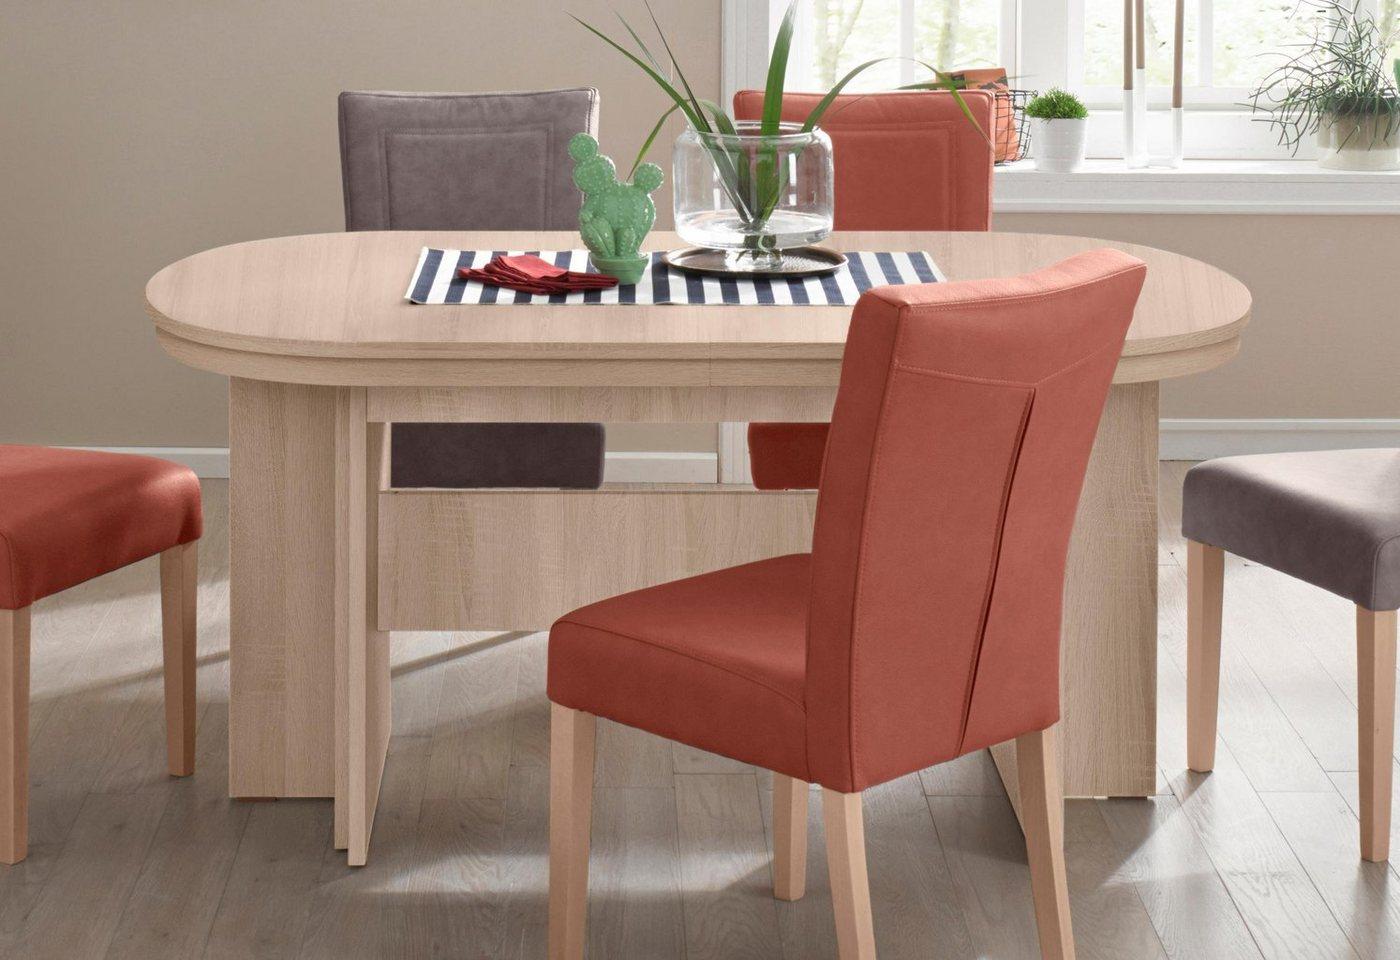 ovaler kulissen esstisch 160 92 cm in 4 farben maximal. Black Bedroom Furniture Sets. Home Design Ideas